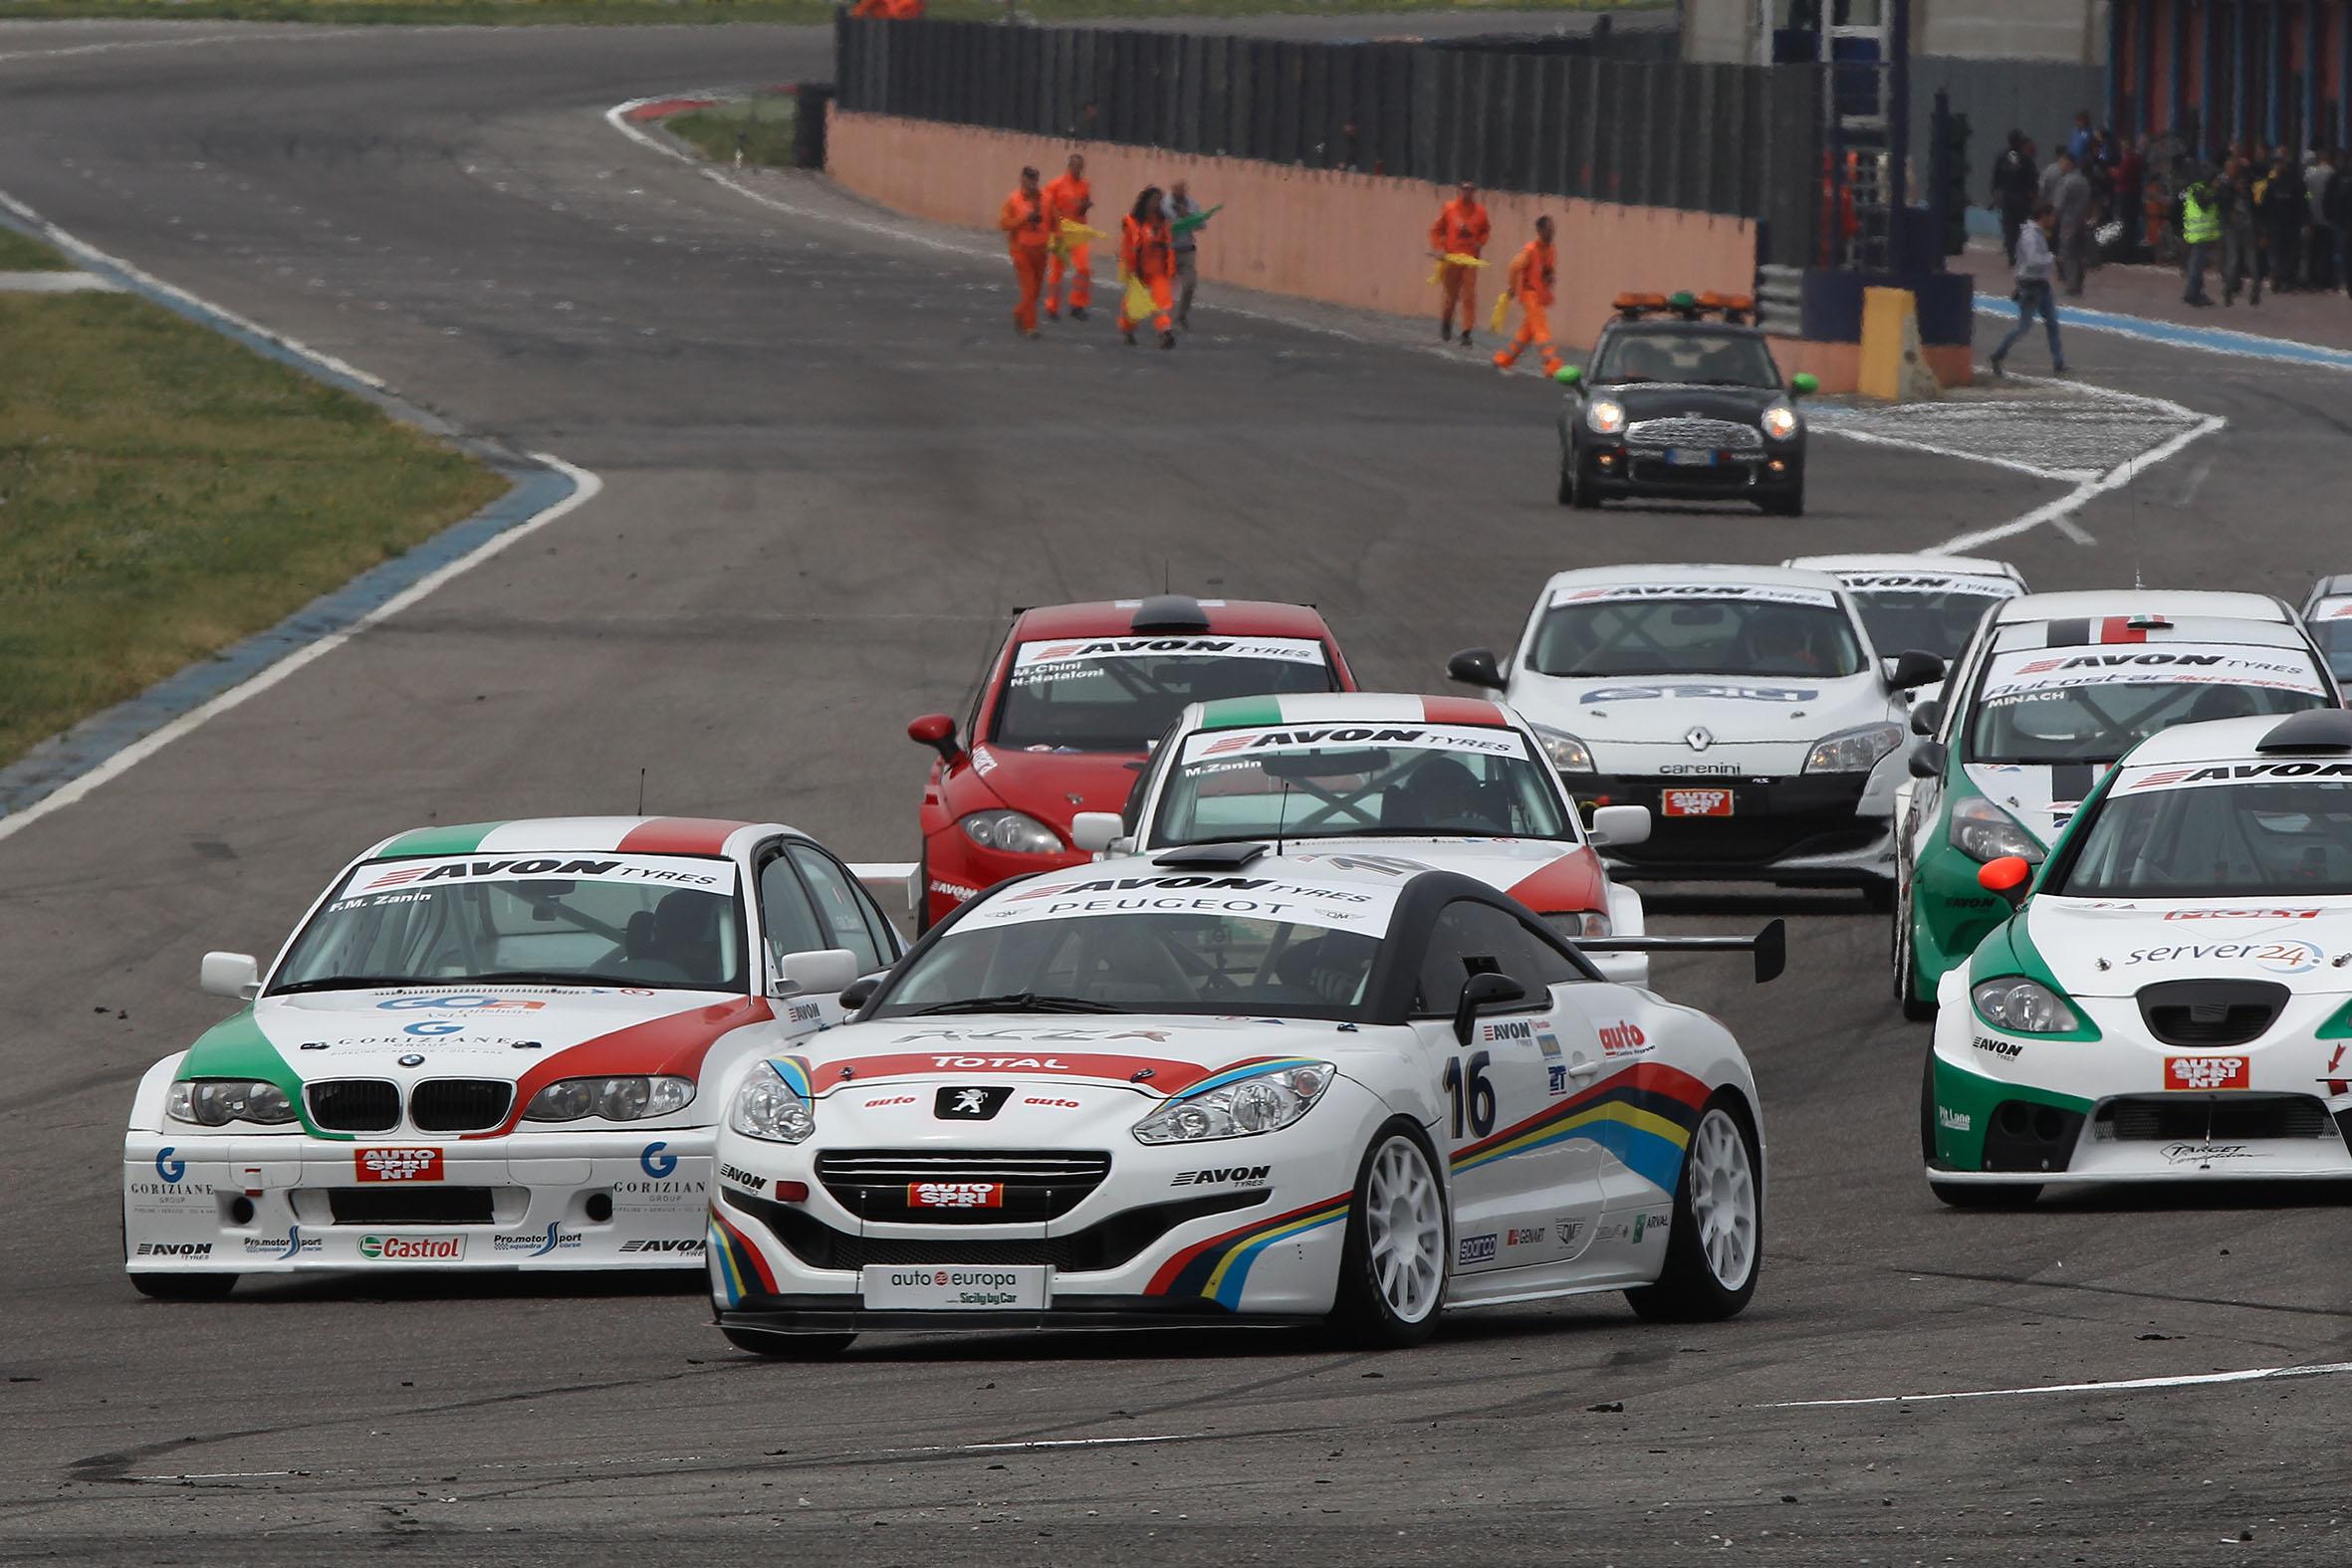 Peugeot RCZ raddoppia nell'Italiano Turismo Endurance